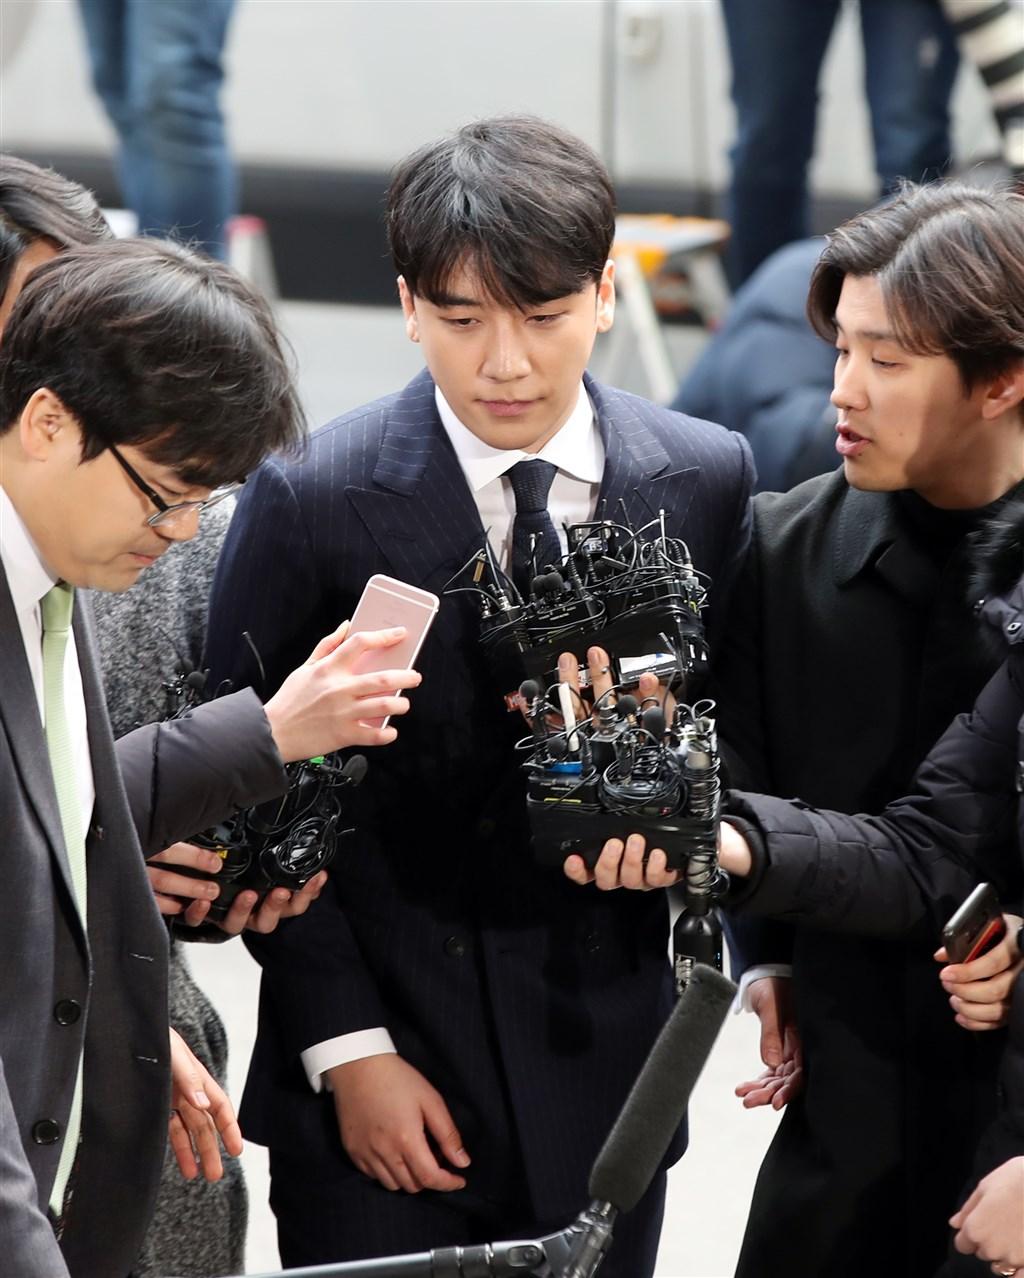 BIGBANG成員勝利(中)涉嫌提供性招待,14日到案接受警方調查。(韓聯社提供)